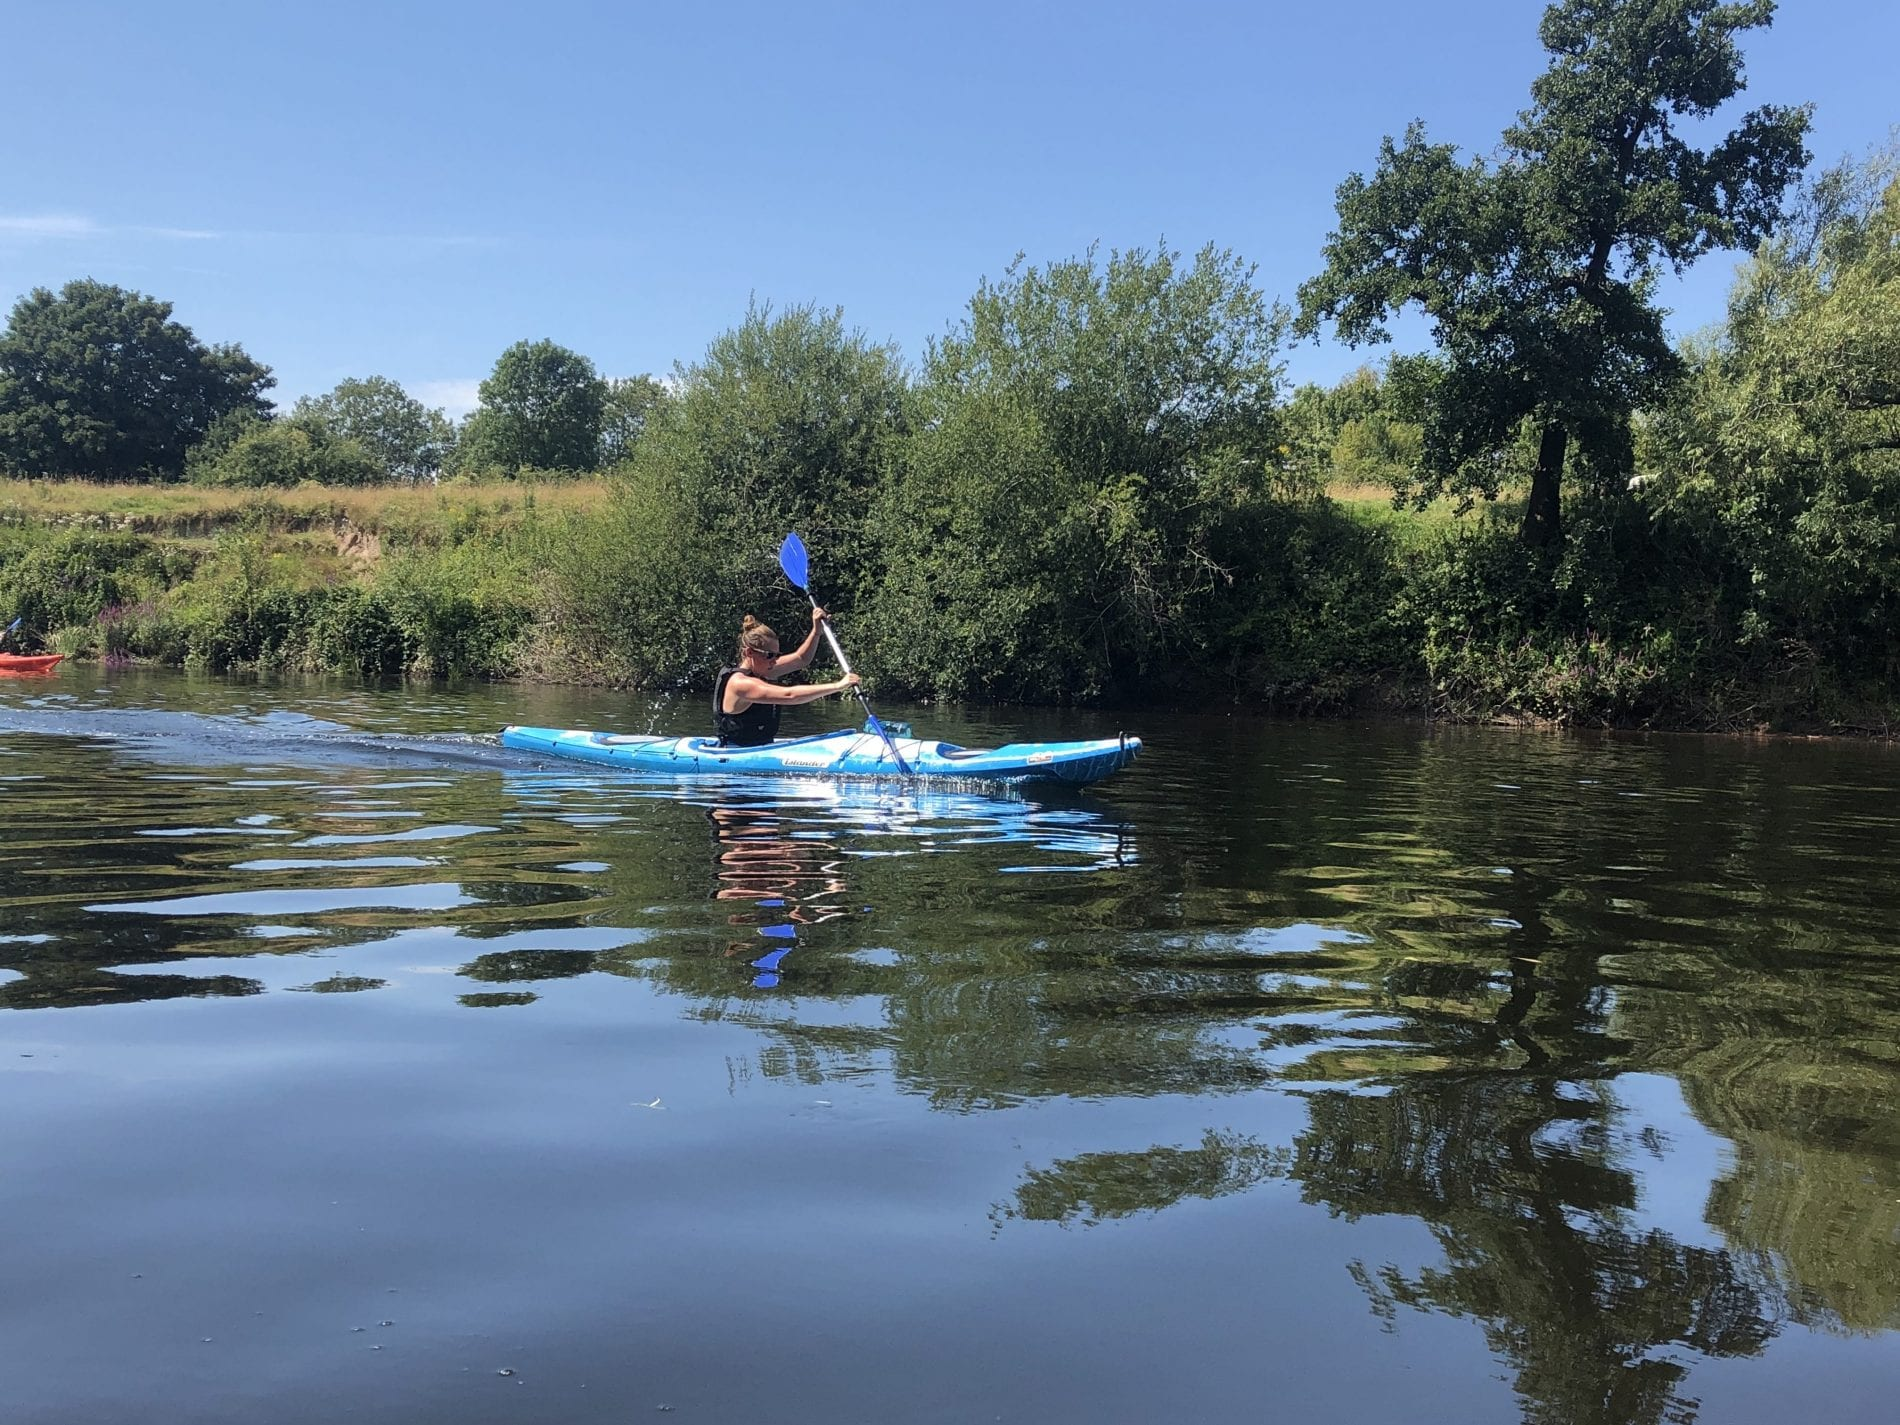 Canoeing on River Wye - Way2Go Adventures